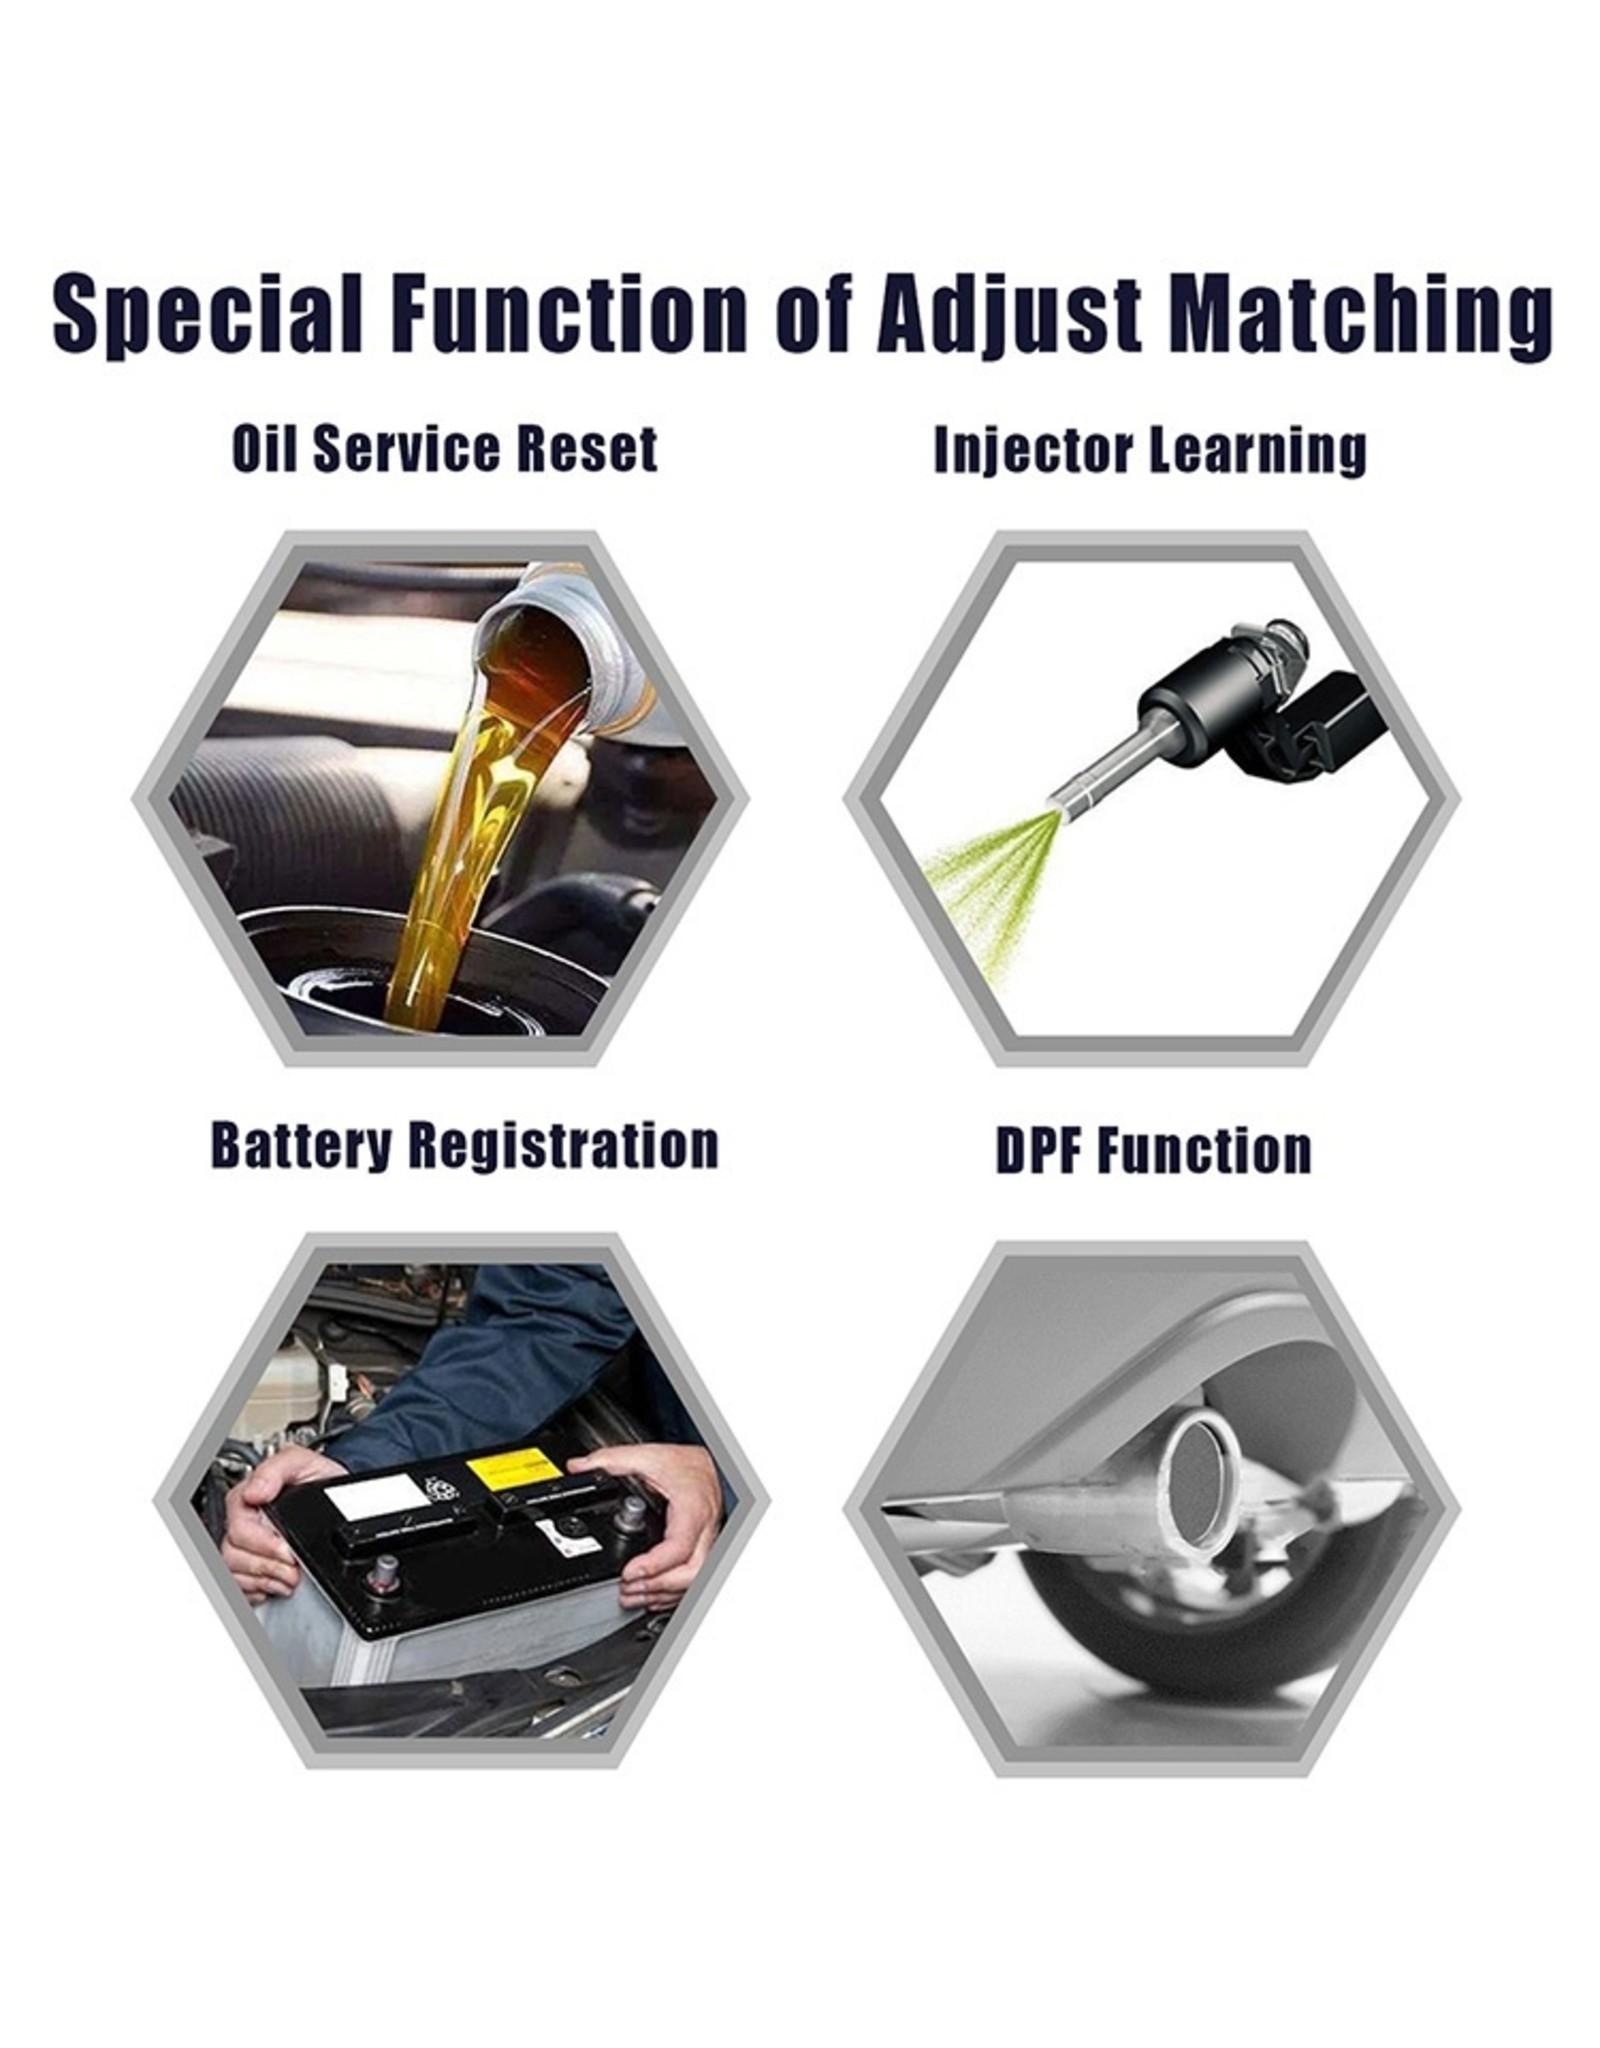 ANCEL VD700 OBD2-scanner Check Engine ABS SRS Alle systemen Diagnostisch Tool met EPB ABS DPF TPMS Oil Reset Injector Codering voor VW Audi Skoda Seat EOBD Code Reader Gratis update